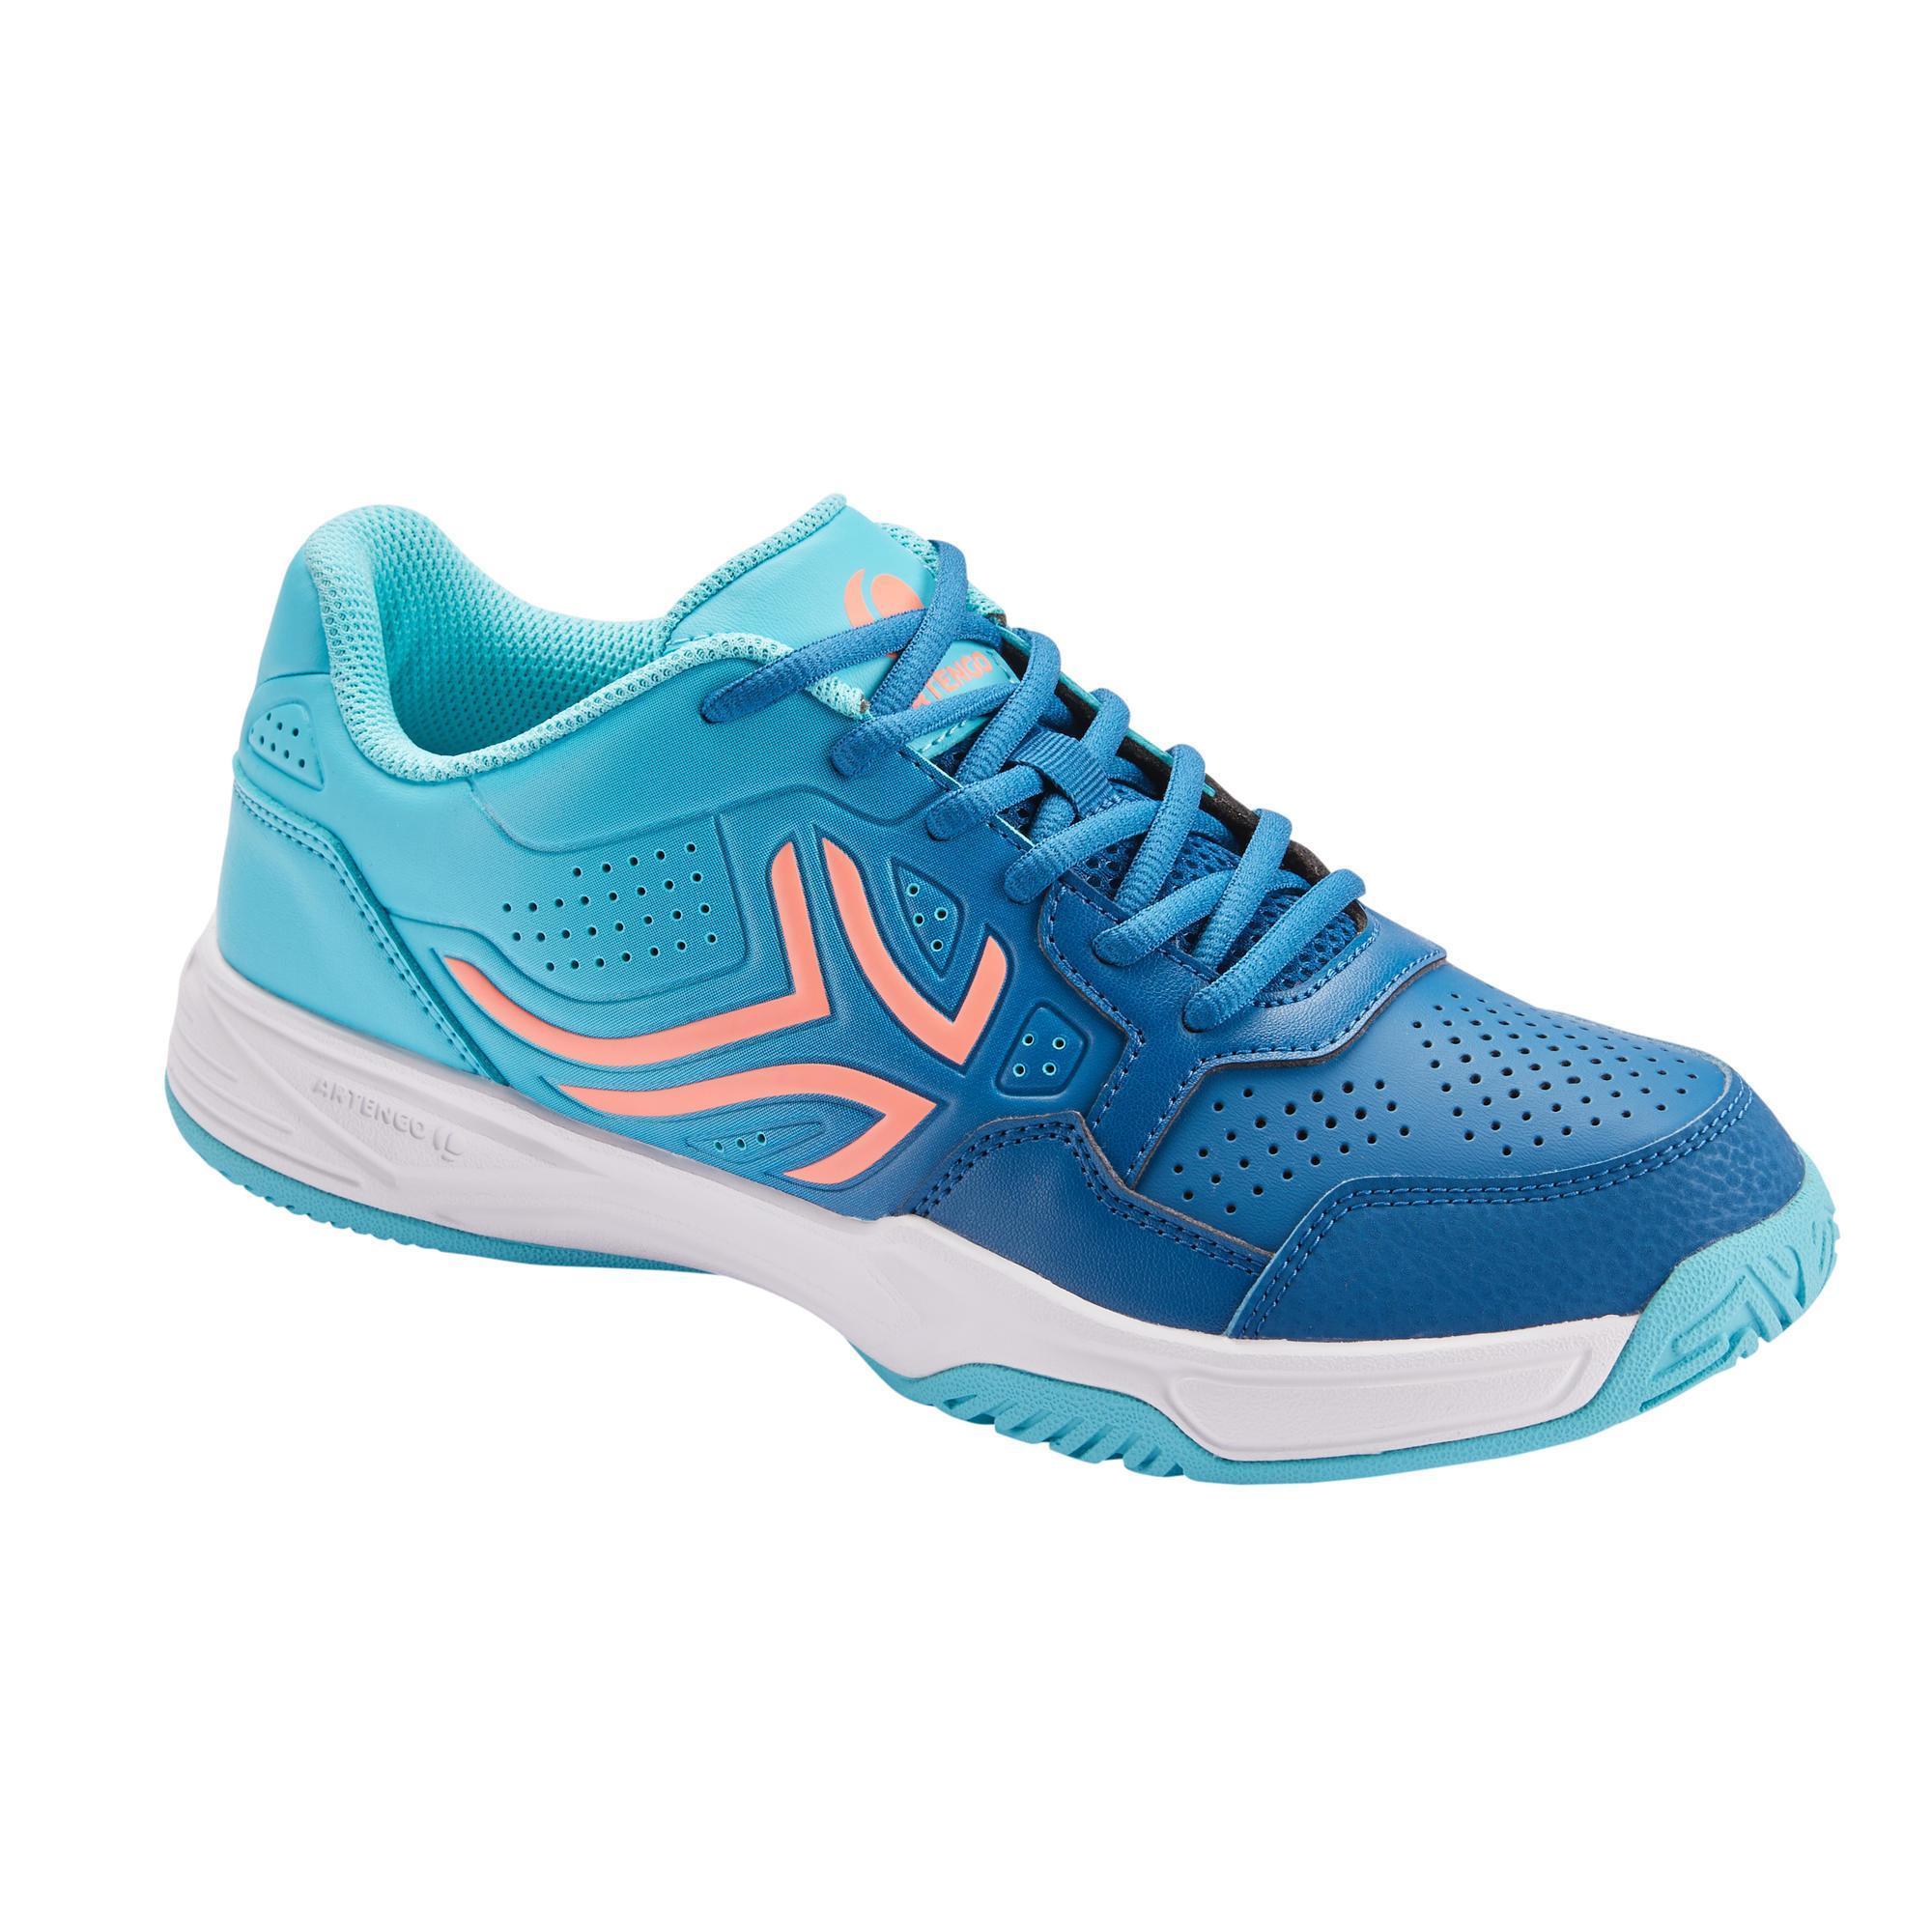 Artengo Tennisschoenen voor dames TS 190 turkoois